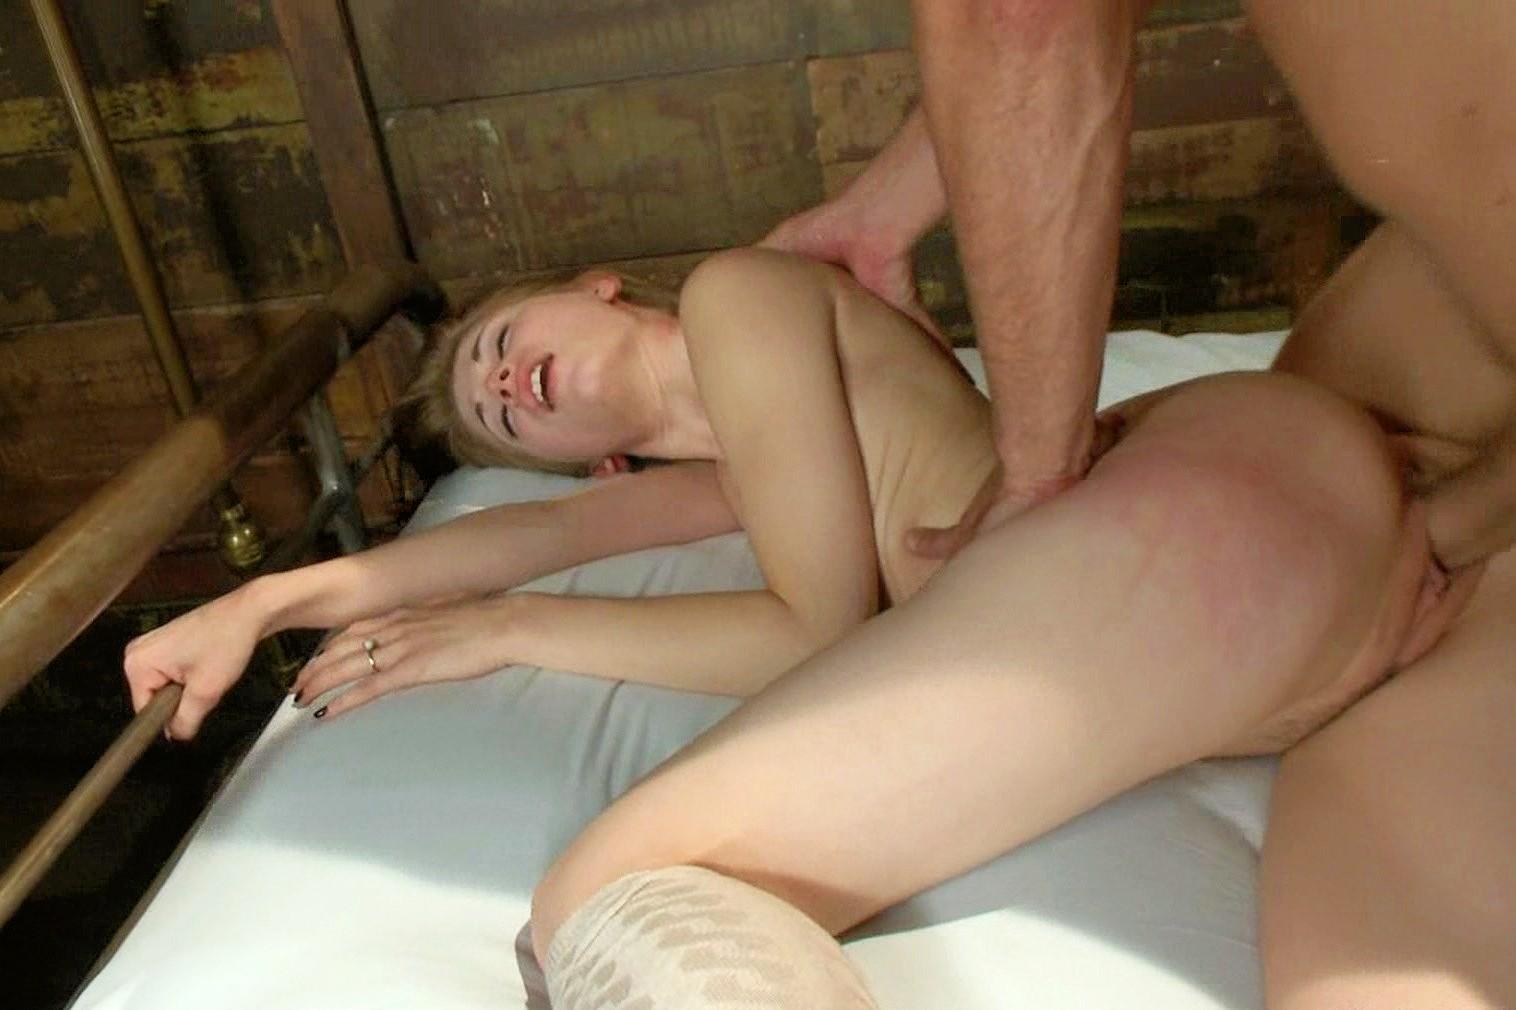 Badtime stories german slave gets fisted in lesbian bdsm 9